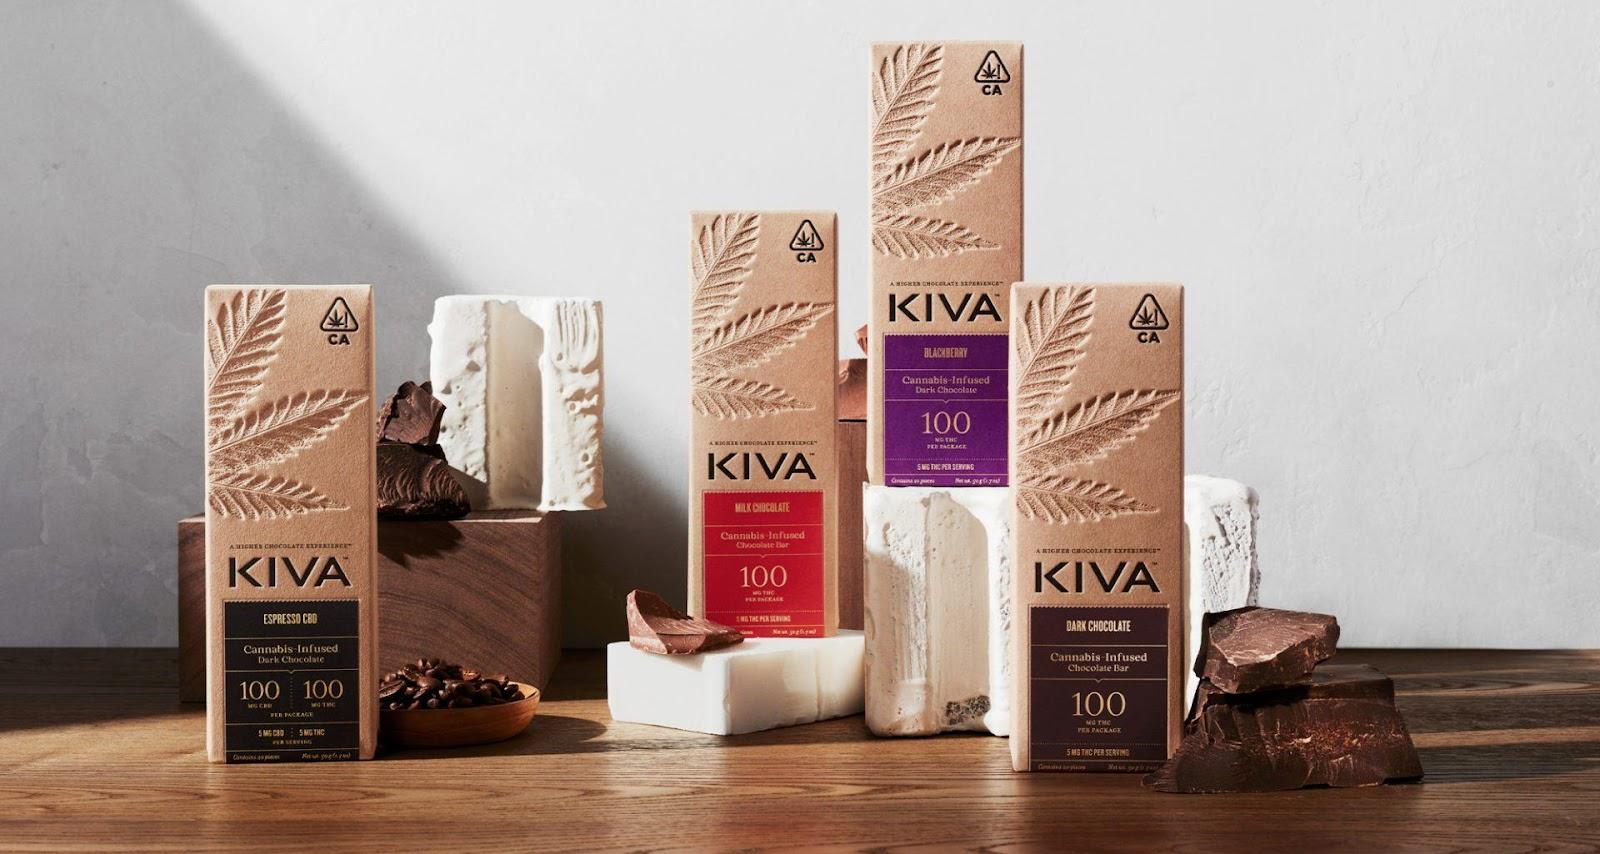 Kiva Chocolates: Premium, Precise Cannabis Chocolate Bars | Kiva Confections